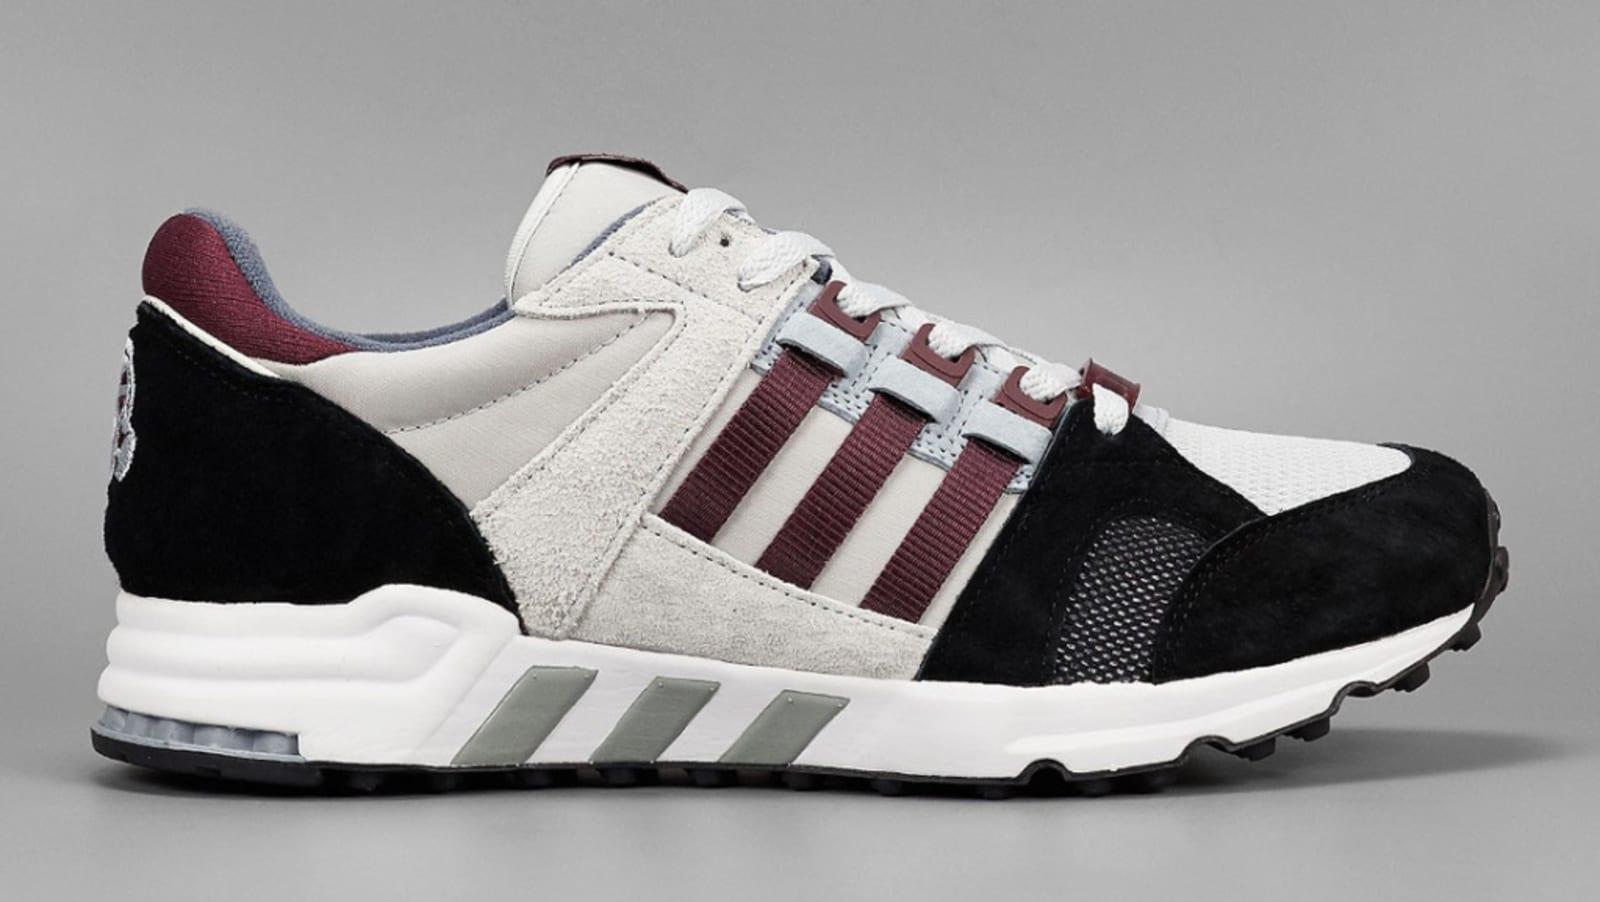 best website 32810 d13ff adidas EQT Running Cushion 93 x Foot Patrol